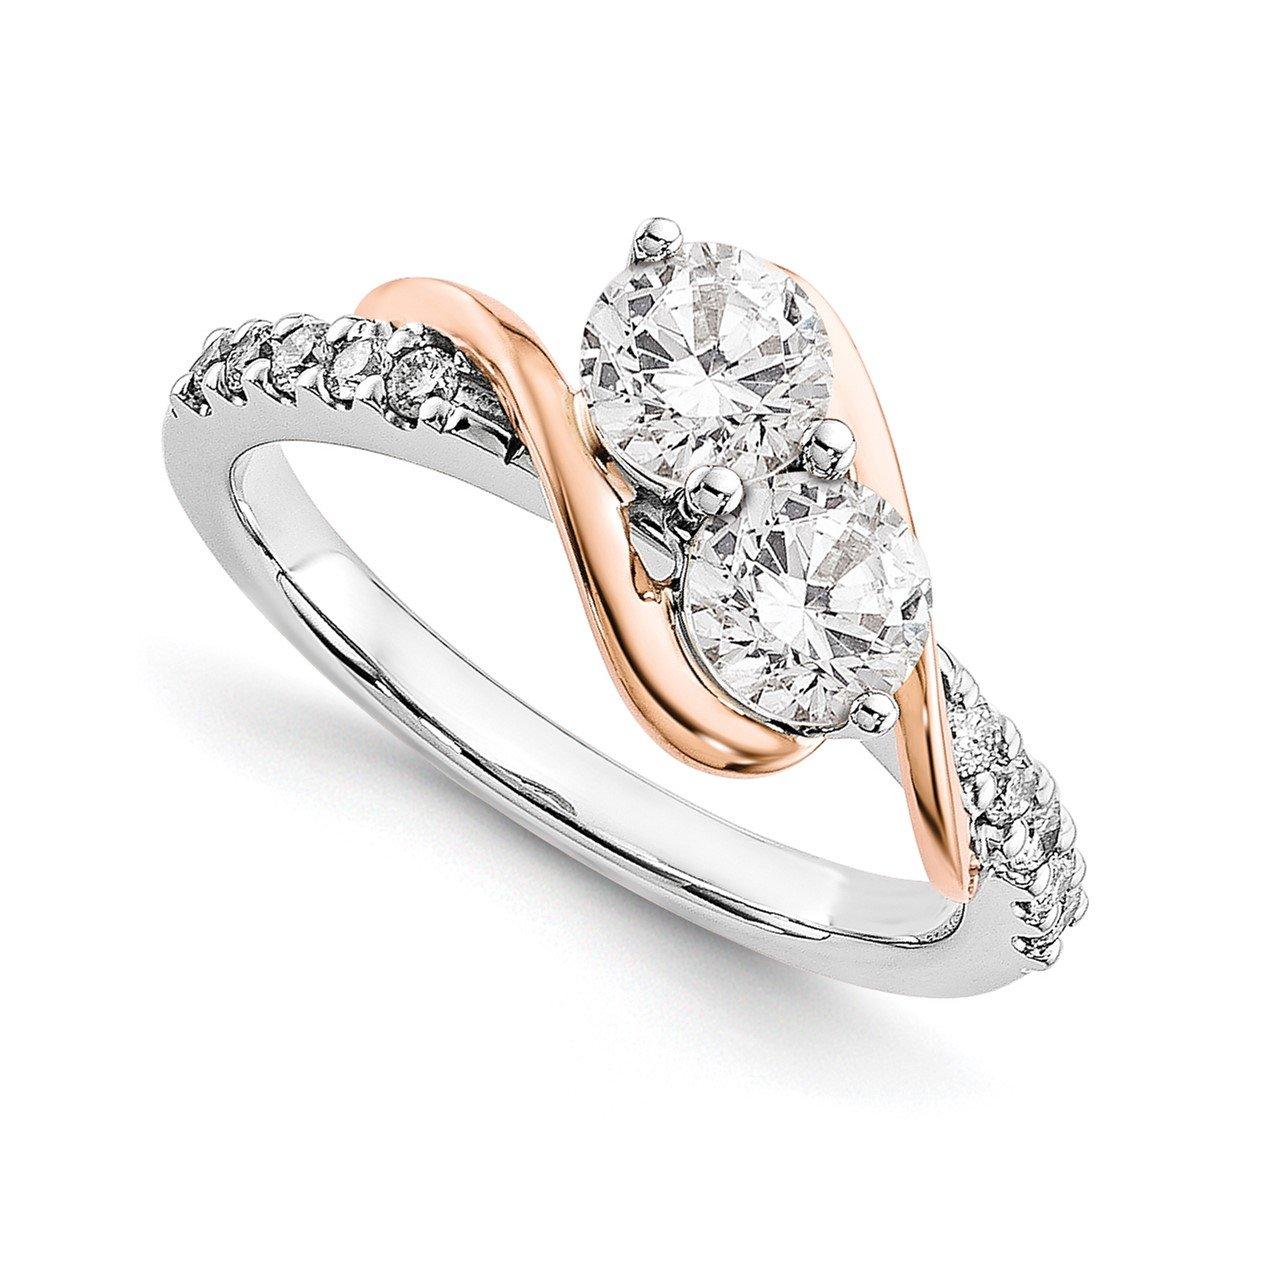 14k White and Rose Gold Diamond Semi-Mount Ring